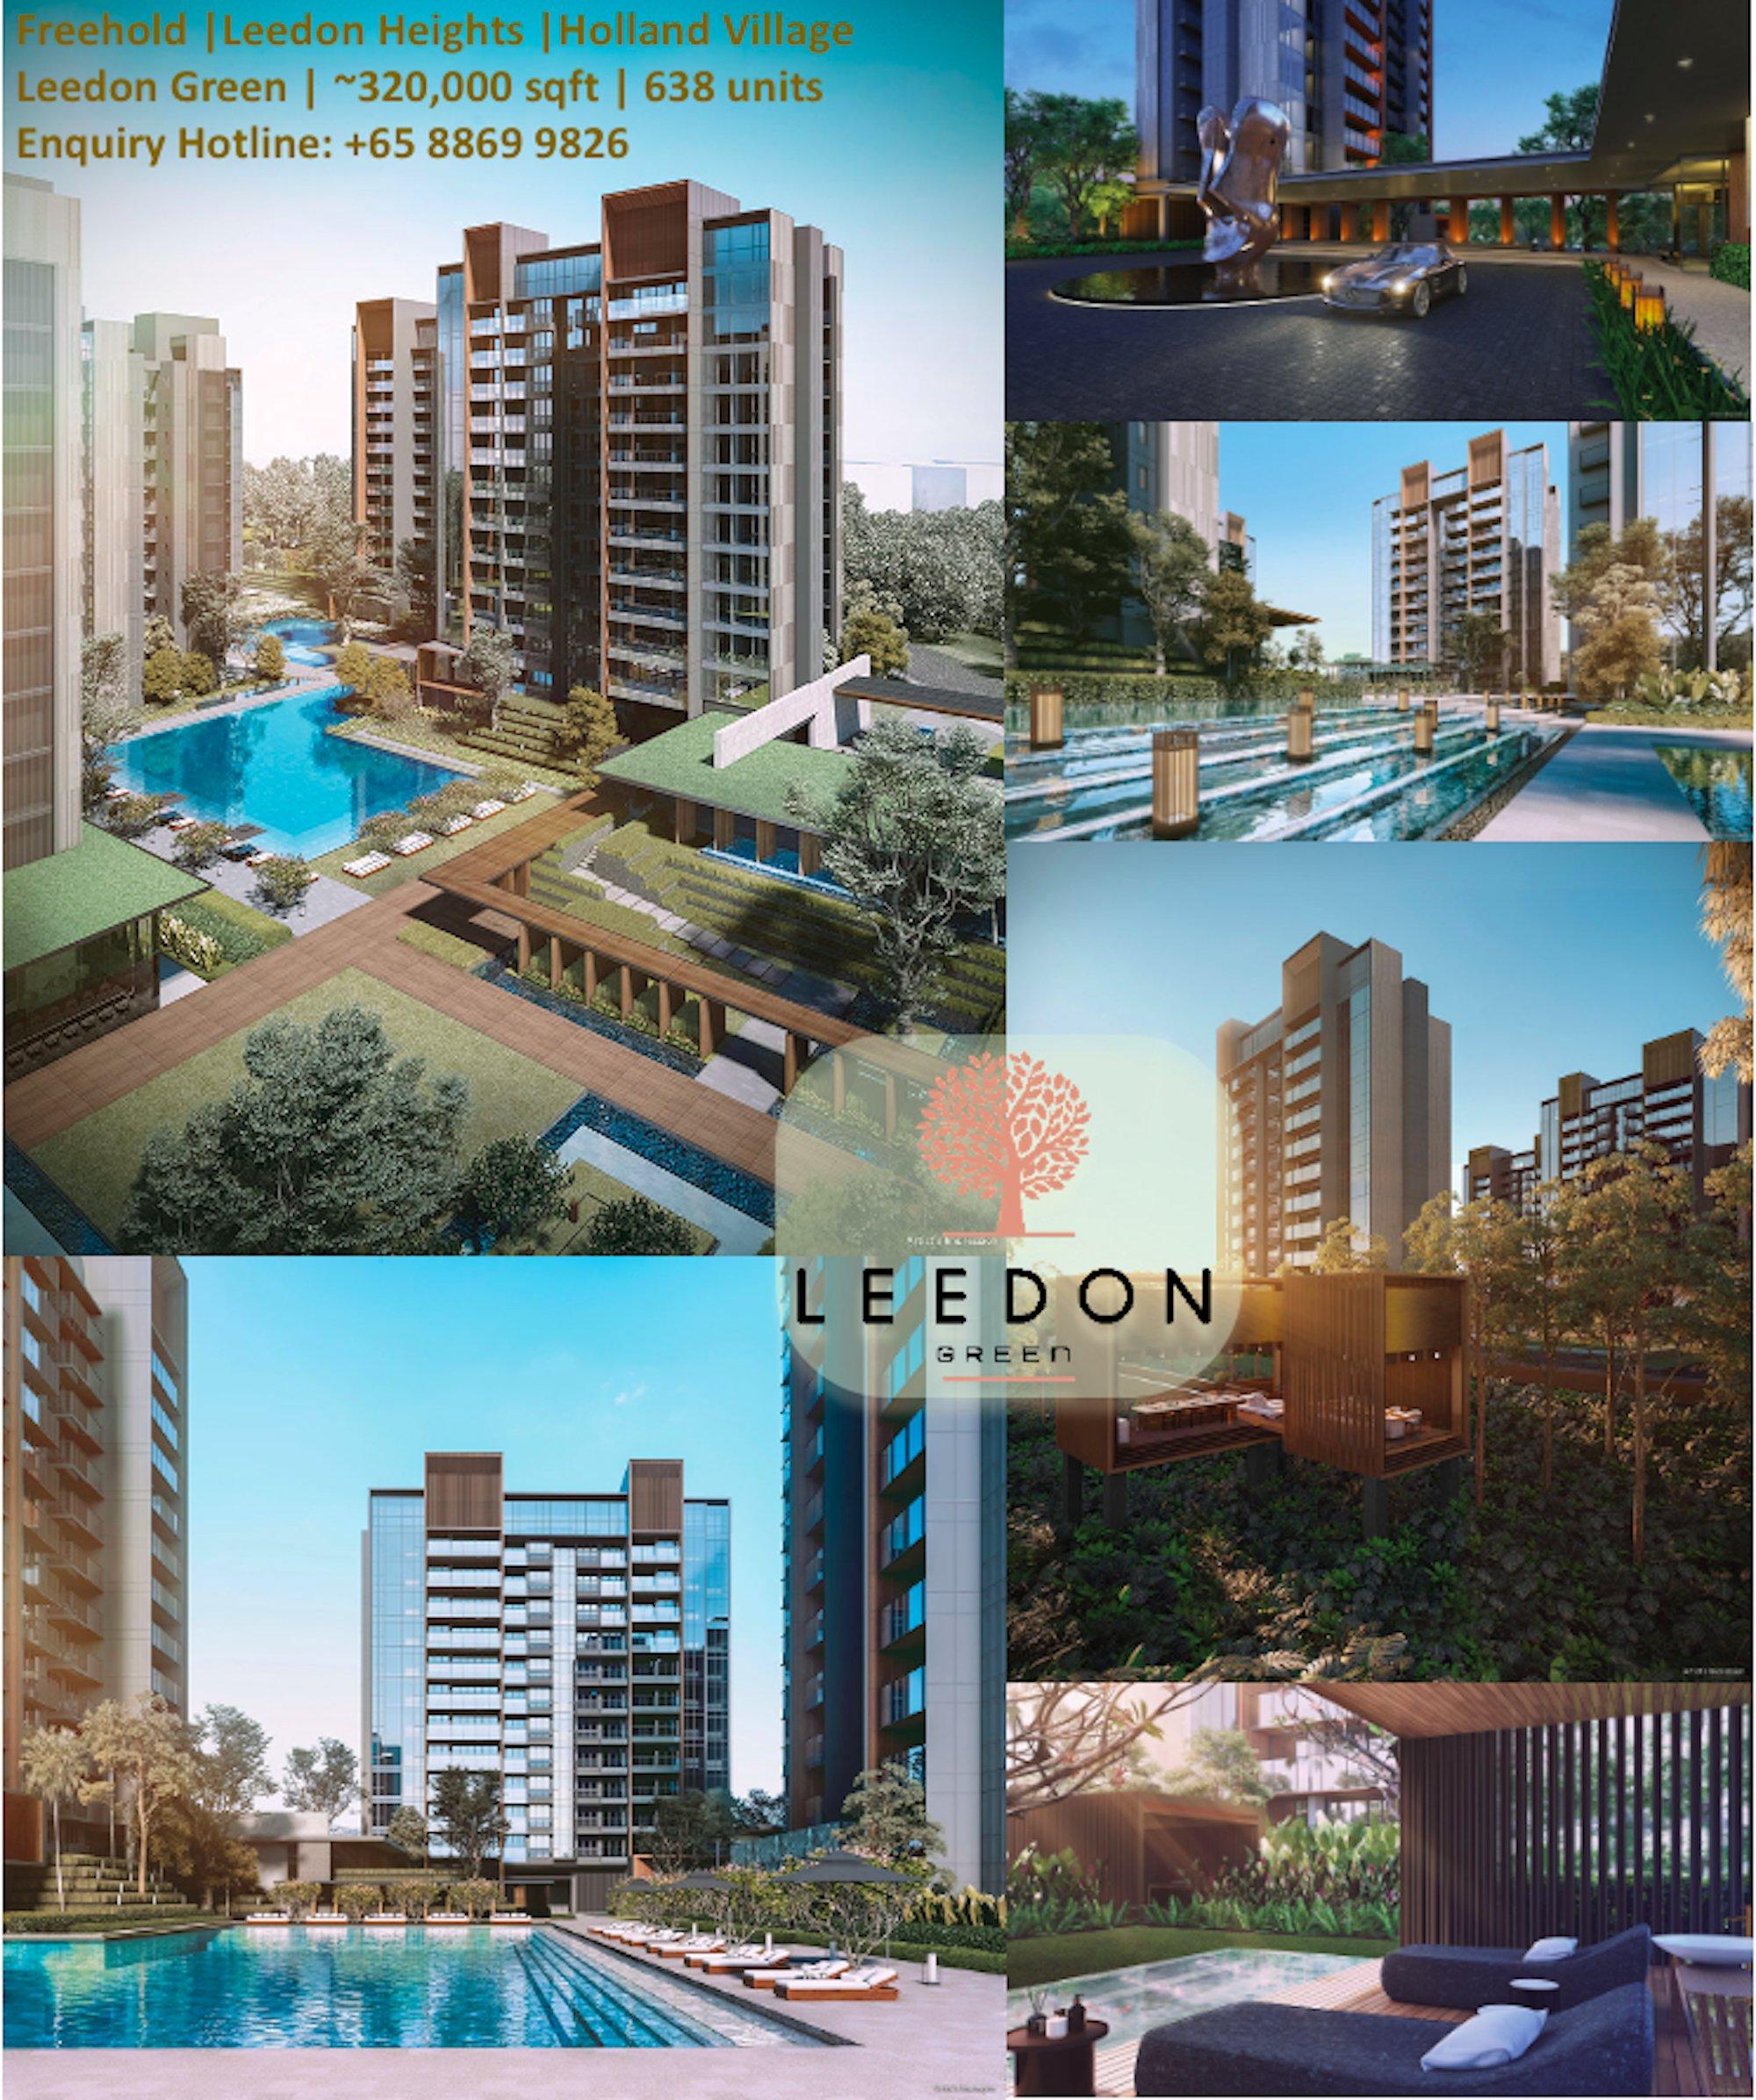 绿墩雅苑永久地契公寓 leedon green freehold overview